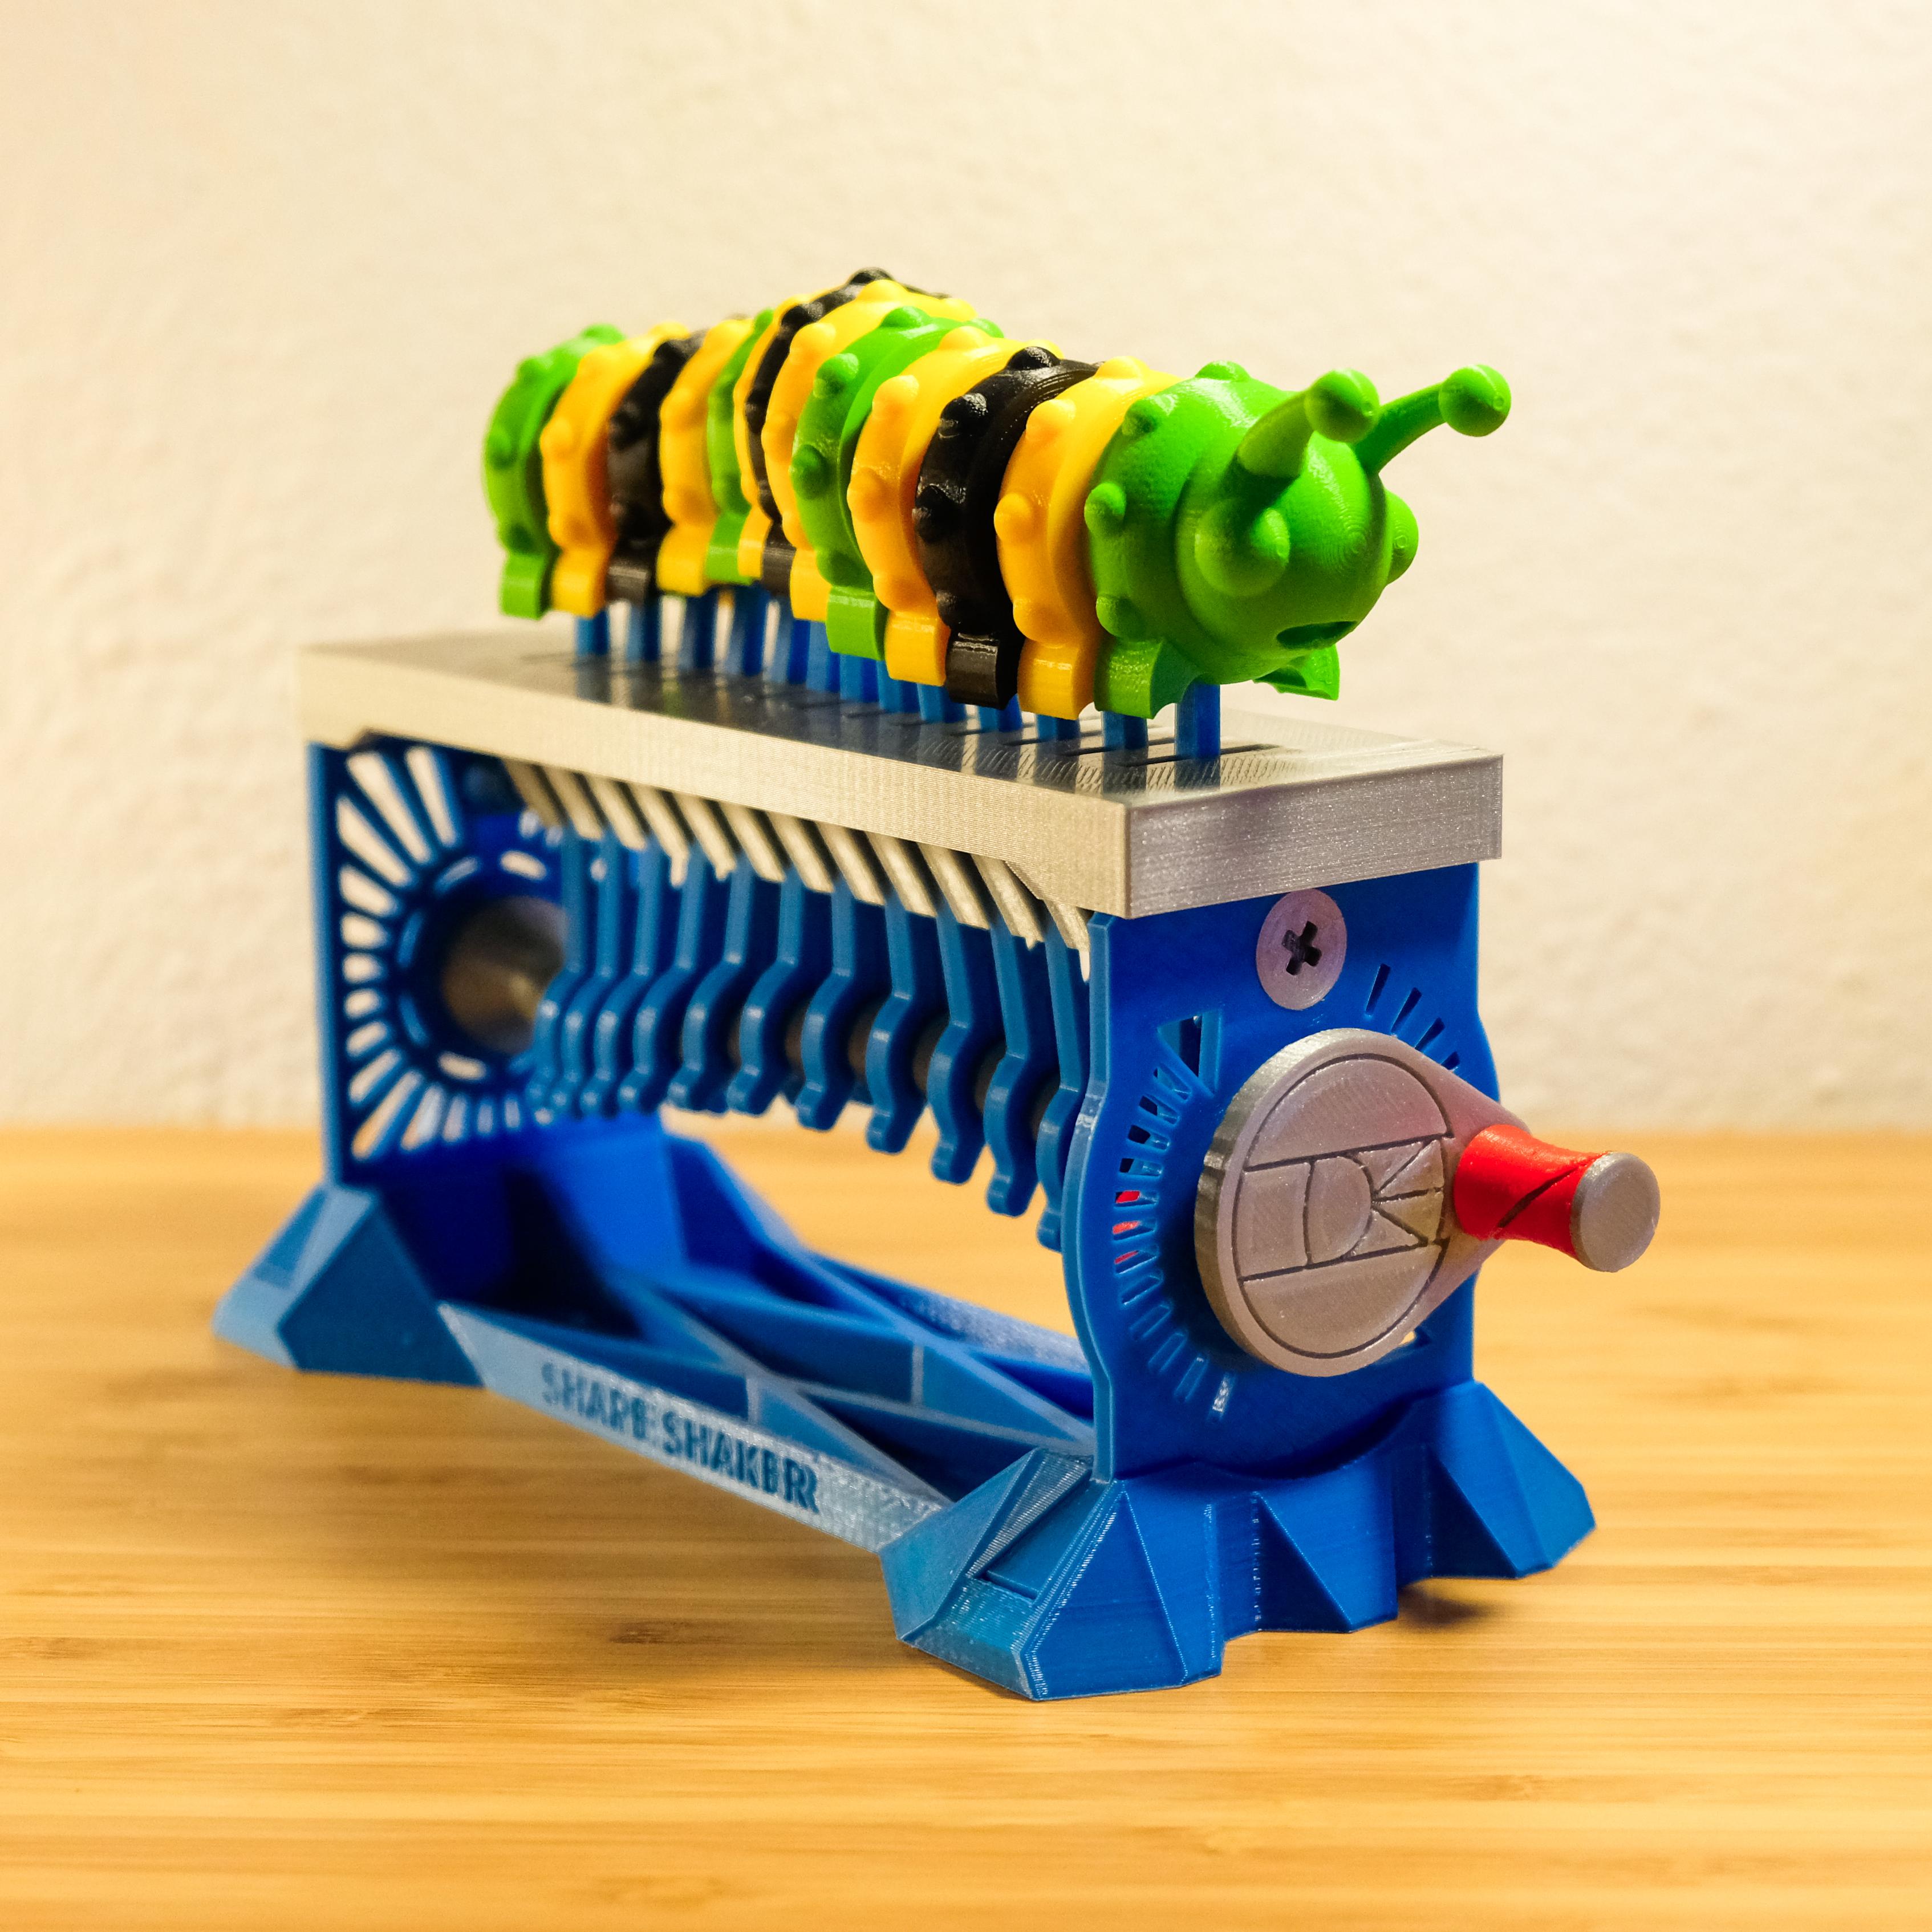 2-8.jpg Download STL file Shape Shaker_Caterpillar • Design to 3D print, Ocrobus